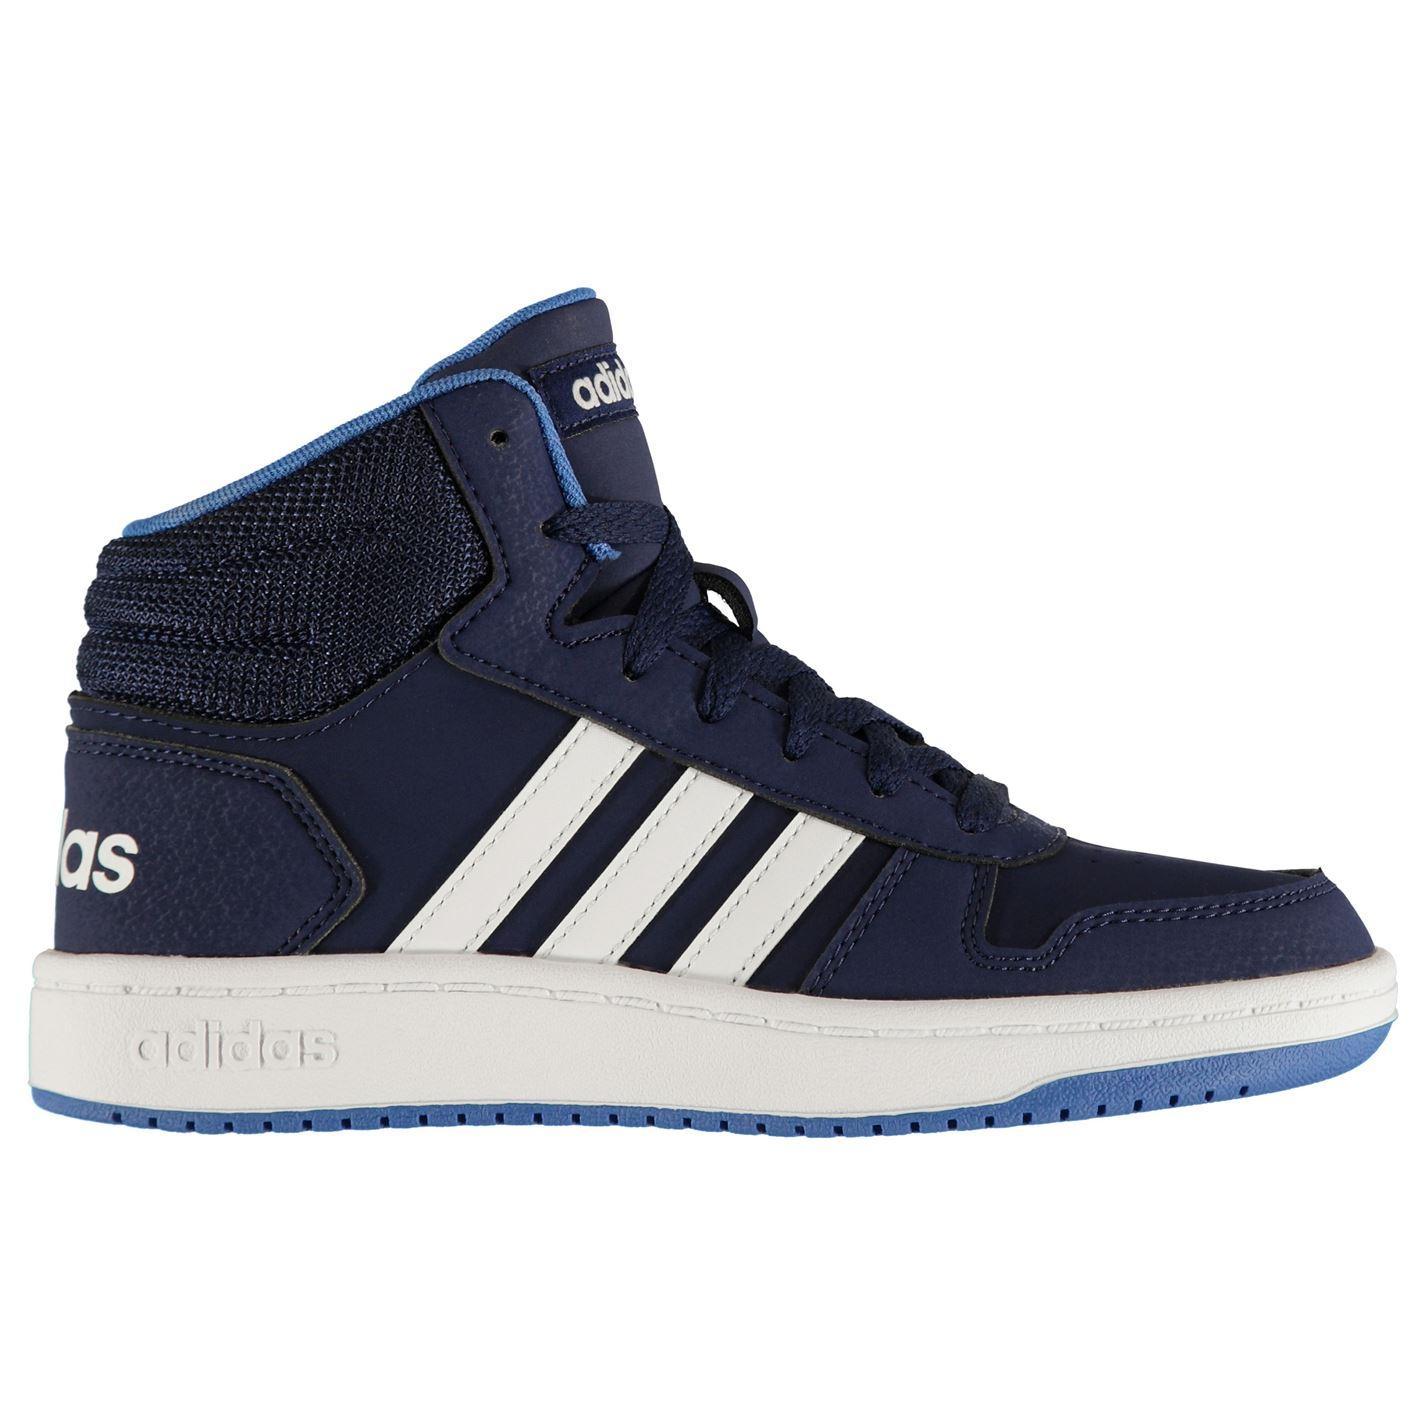 adidas Hoops Mid 2.0 High Top Tenisky Junior chlapecké - Glami.sk 901dbd4bf10